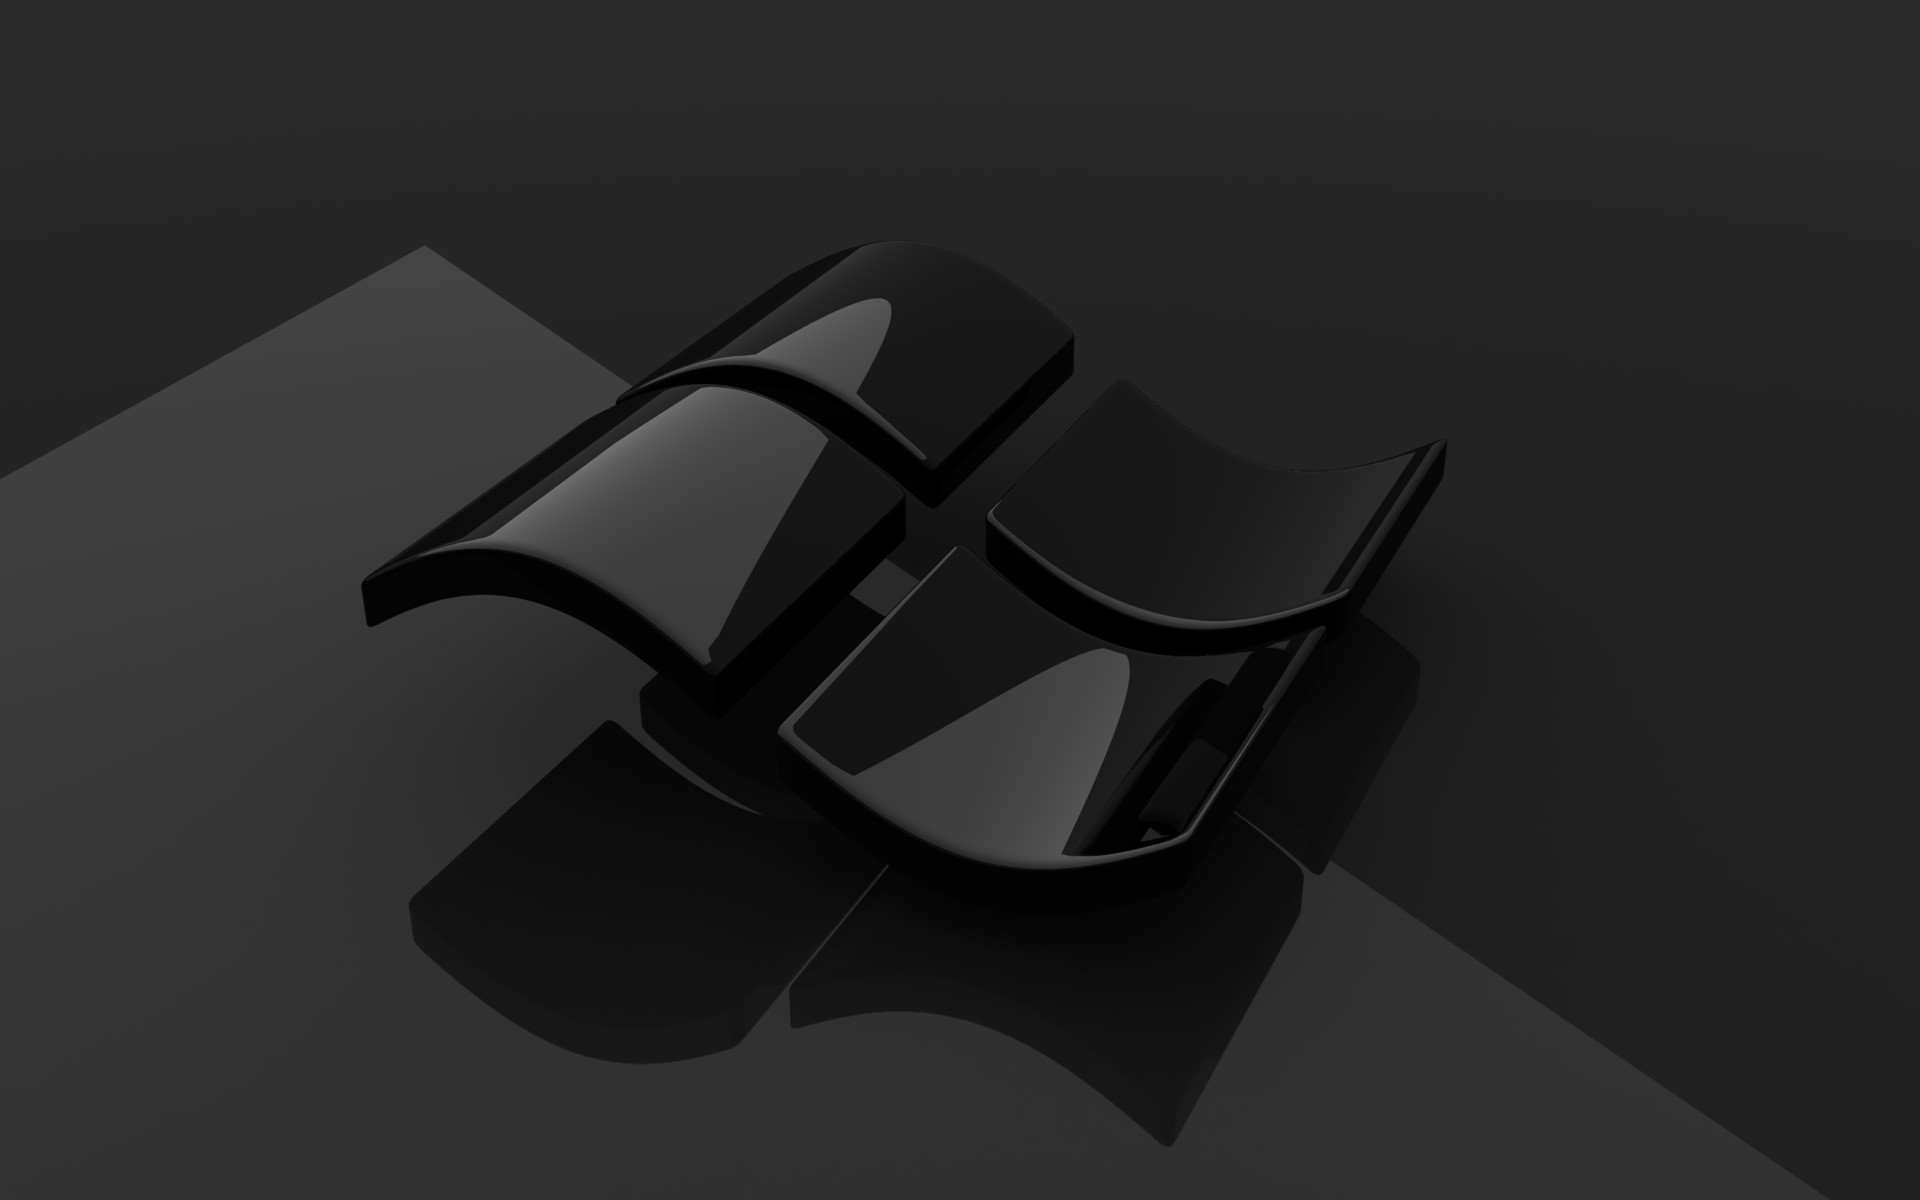 Free 3d Wallpaper For Windows 7 Black Wallpaper Windows 10 61 Images